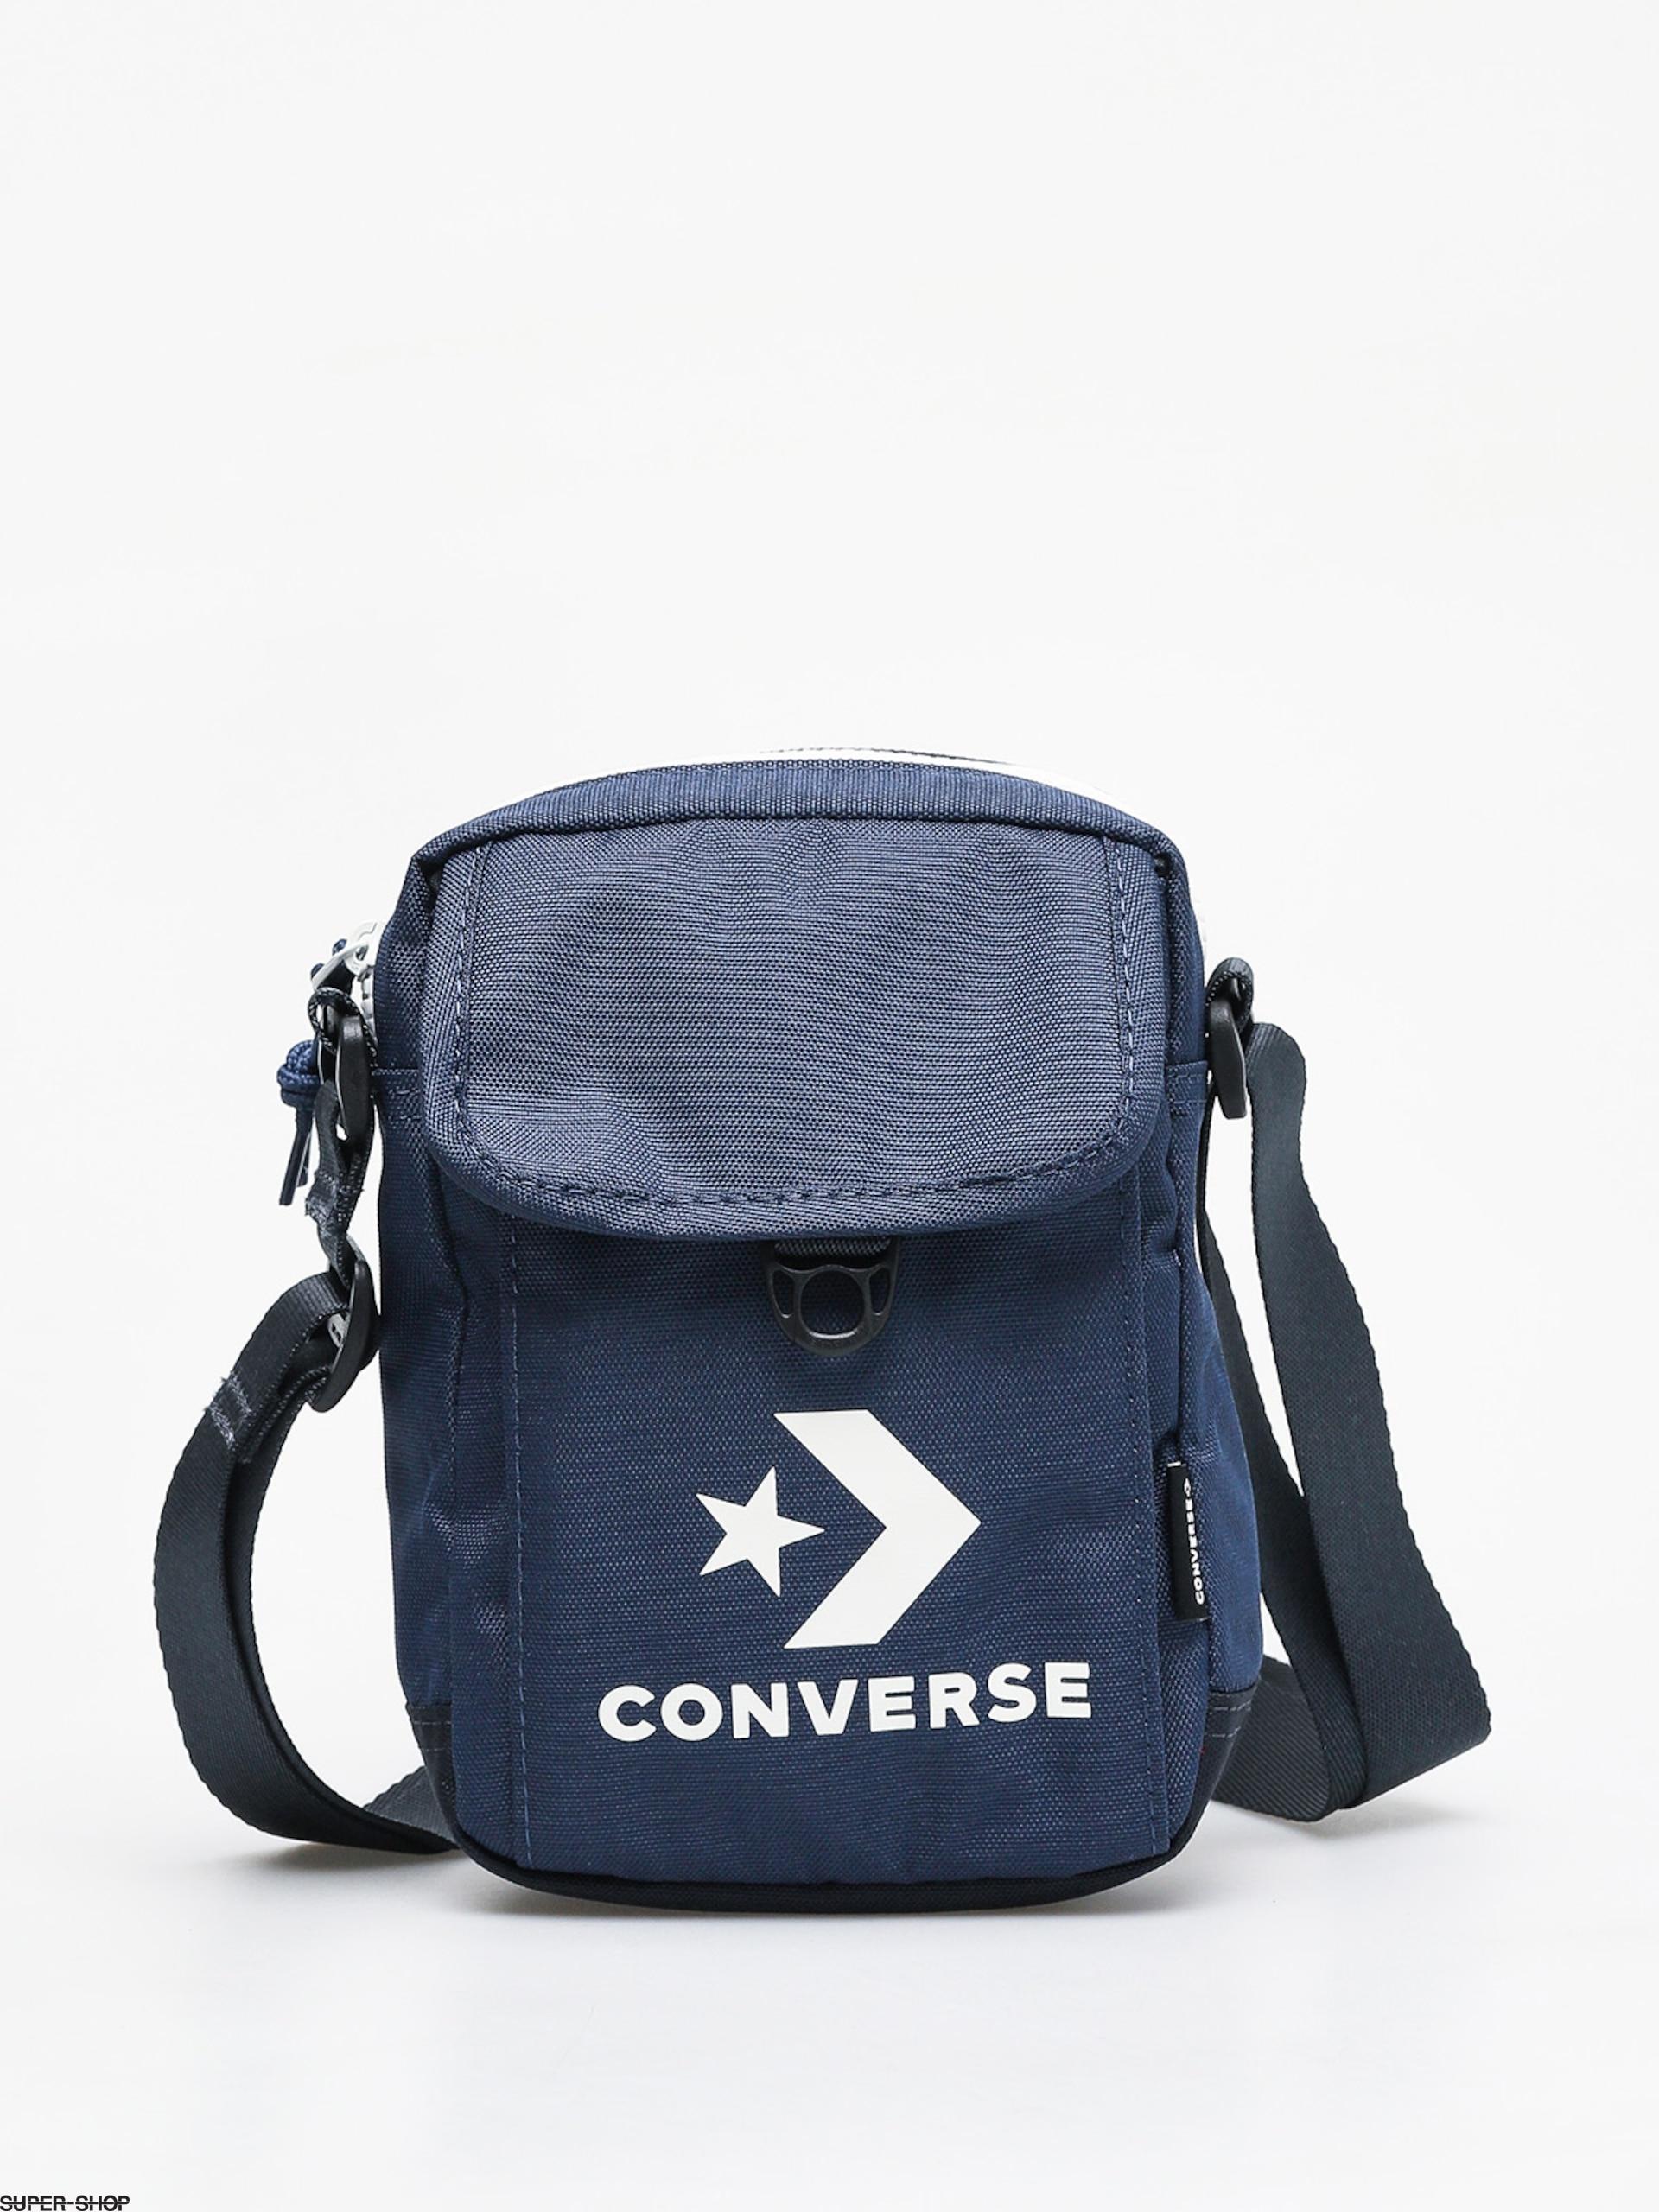 a95d50272 1042986-w1920-converse-cross-body-2-bag-navy-dark-obsidian-white.jpg